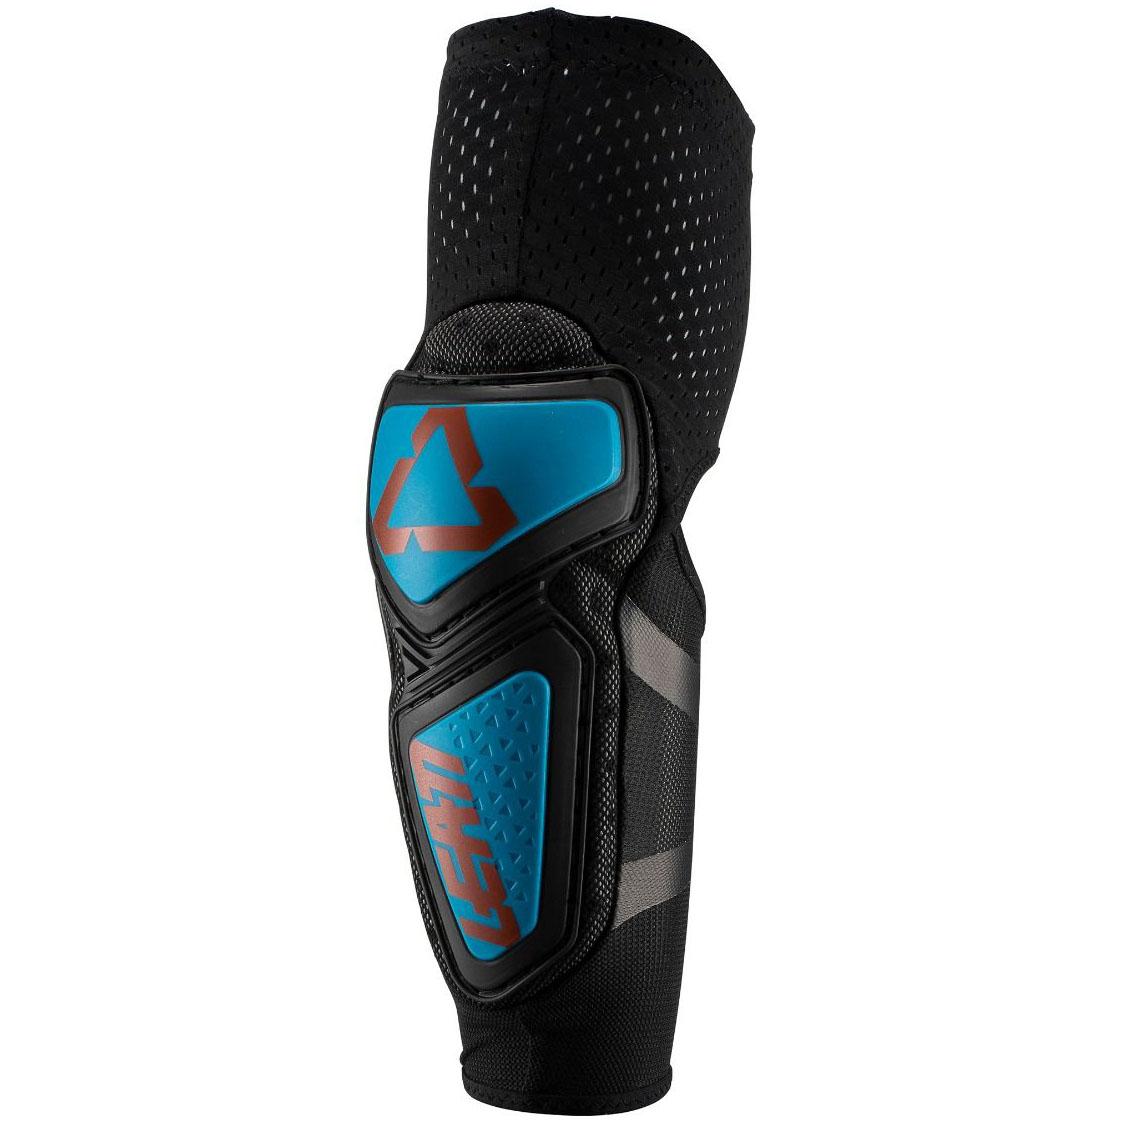 Leatt - 2019 Contour Elbow Guard Fuel/Black защита локтей, синяя